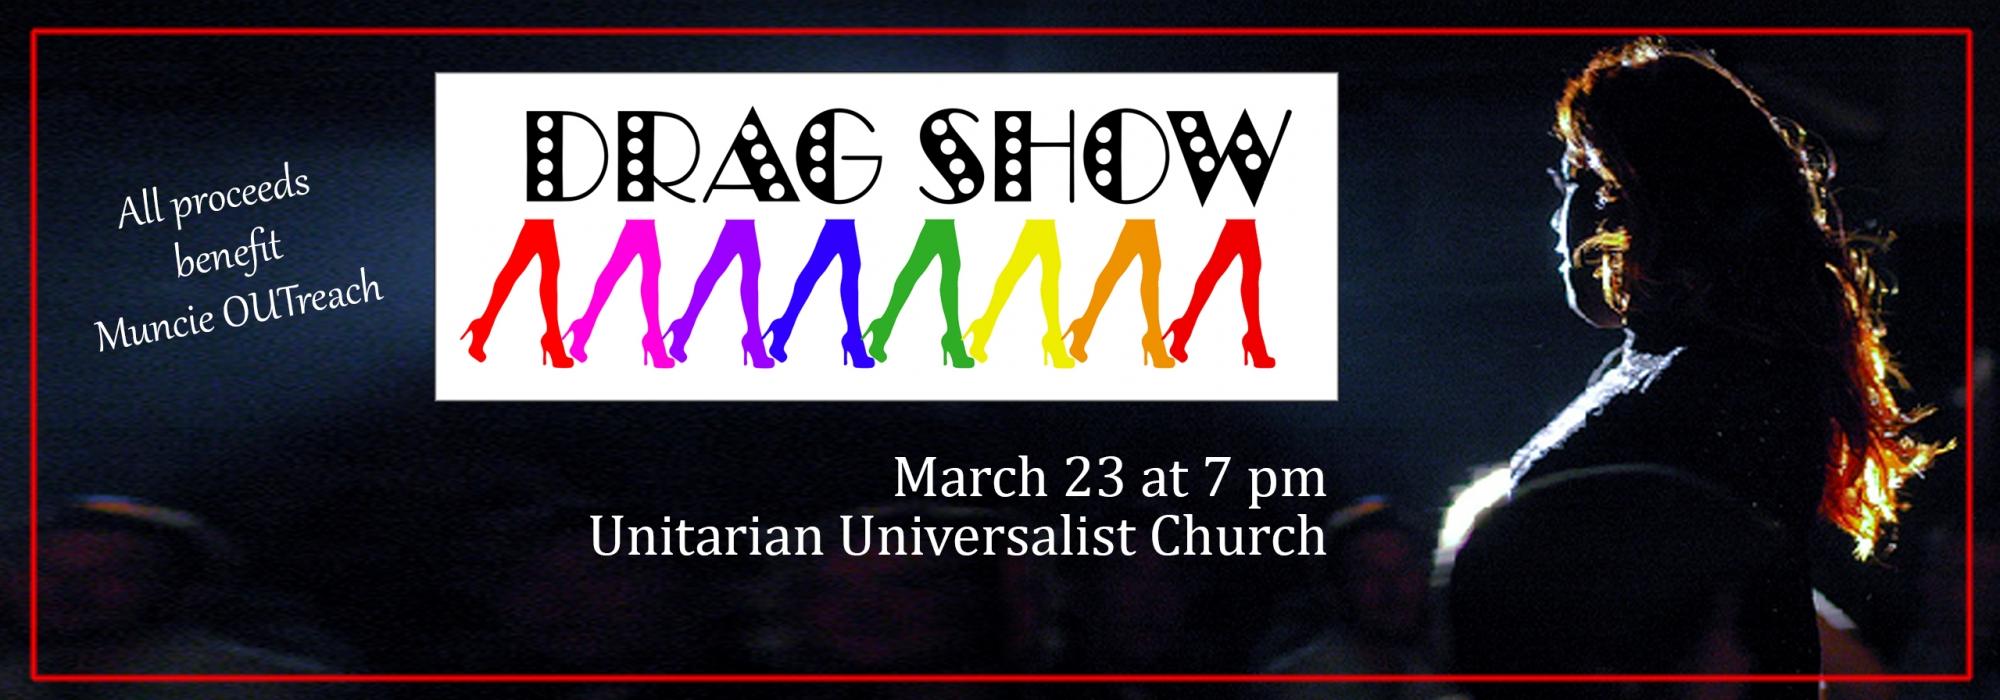 Drag Show banner